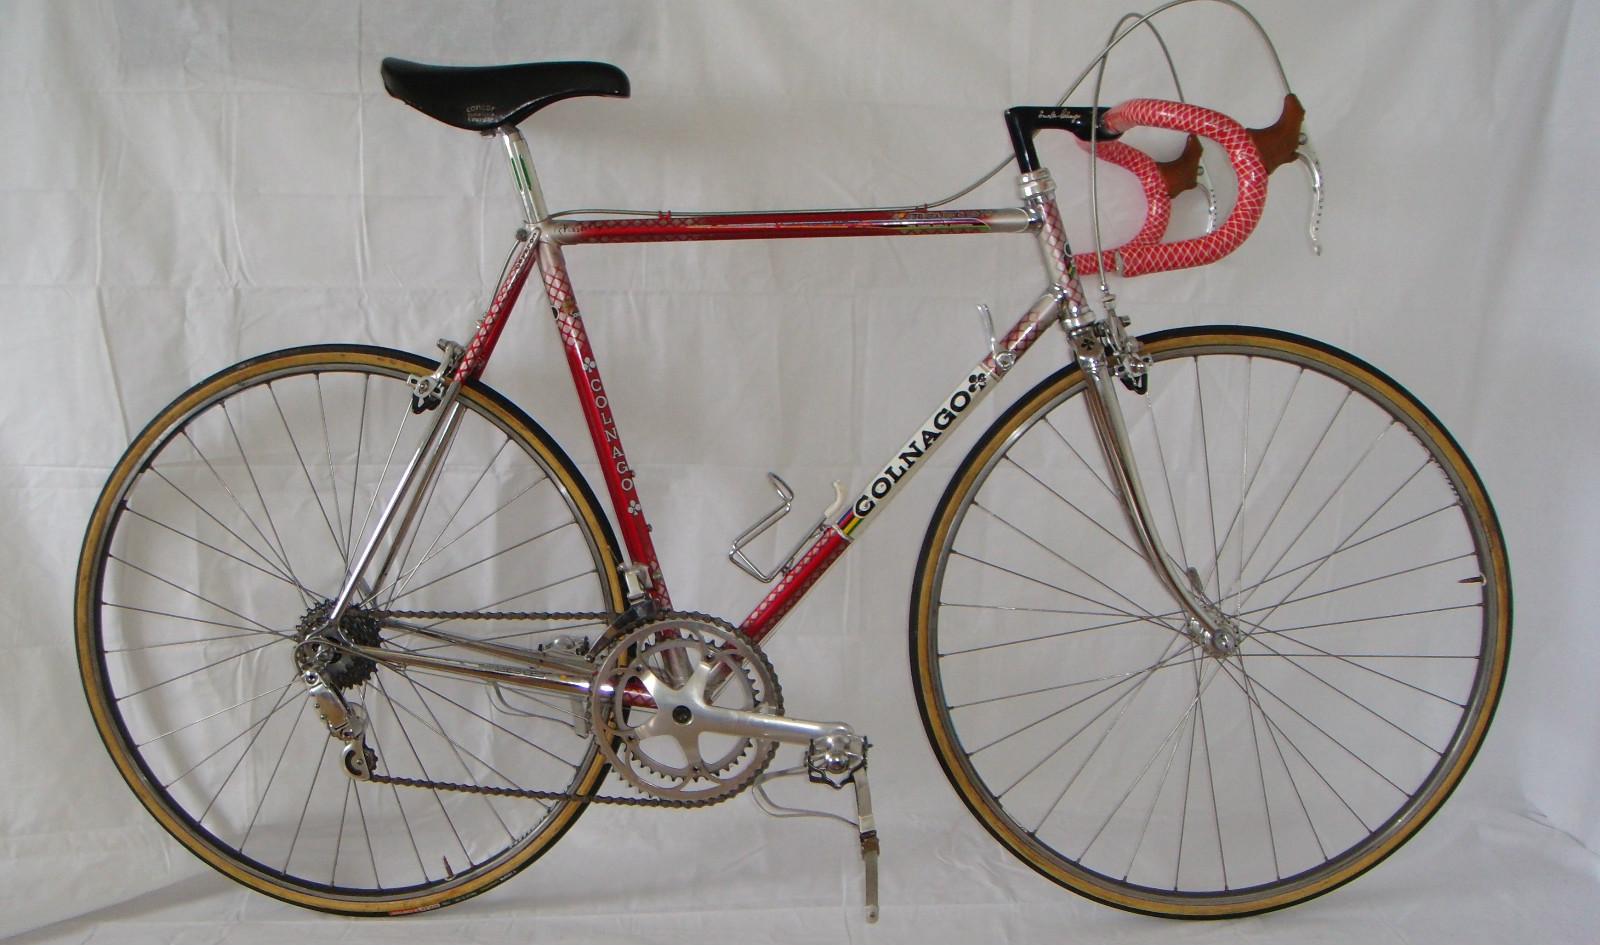 ff14dd764 A 1986 Colnago Master ex pro Del Tongo roadbike..   (KGrHqNHJDcFHG6VodE0BR6VGEZi!w~~60 57